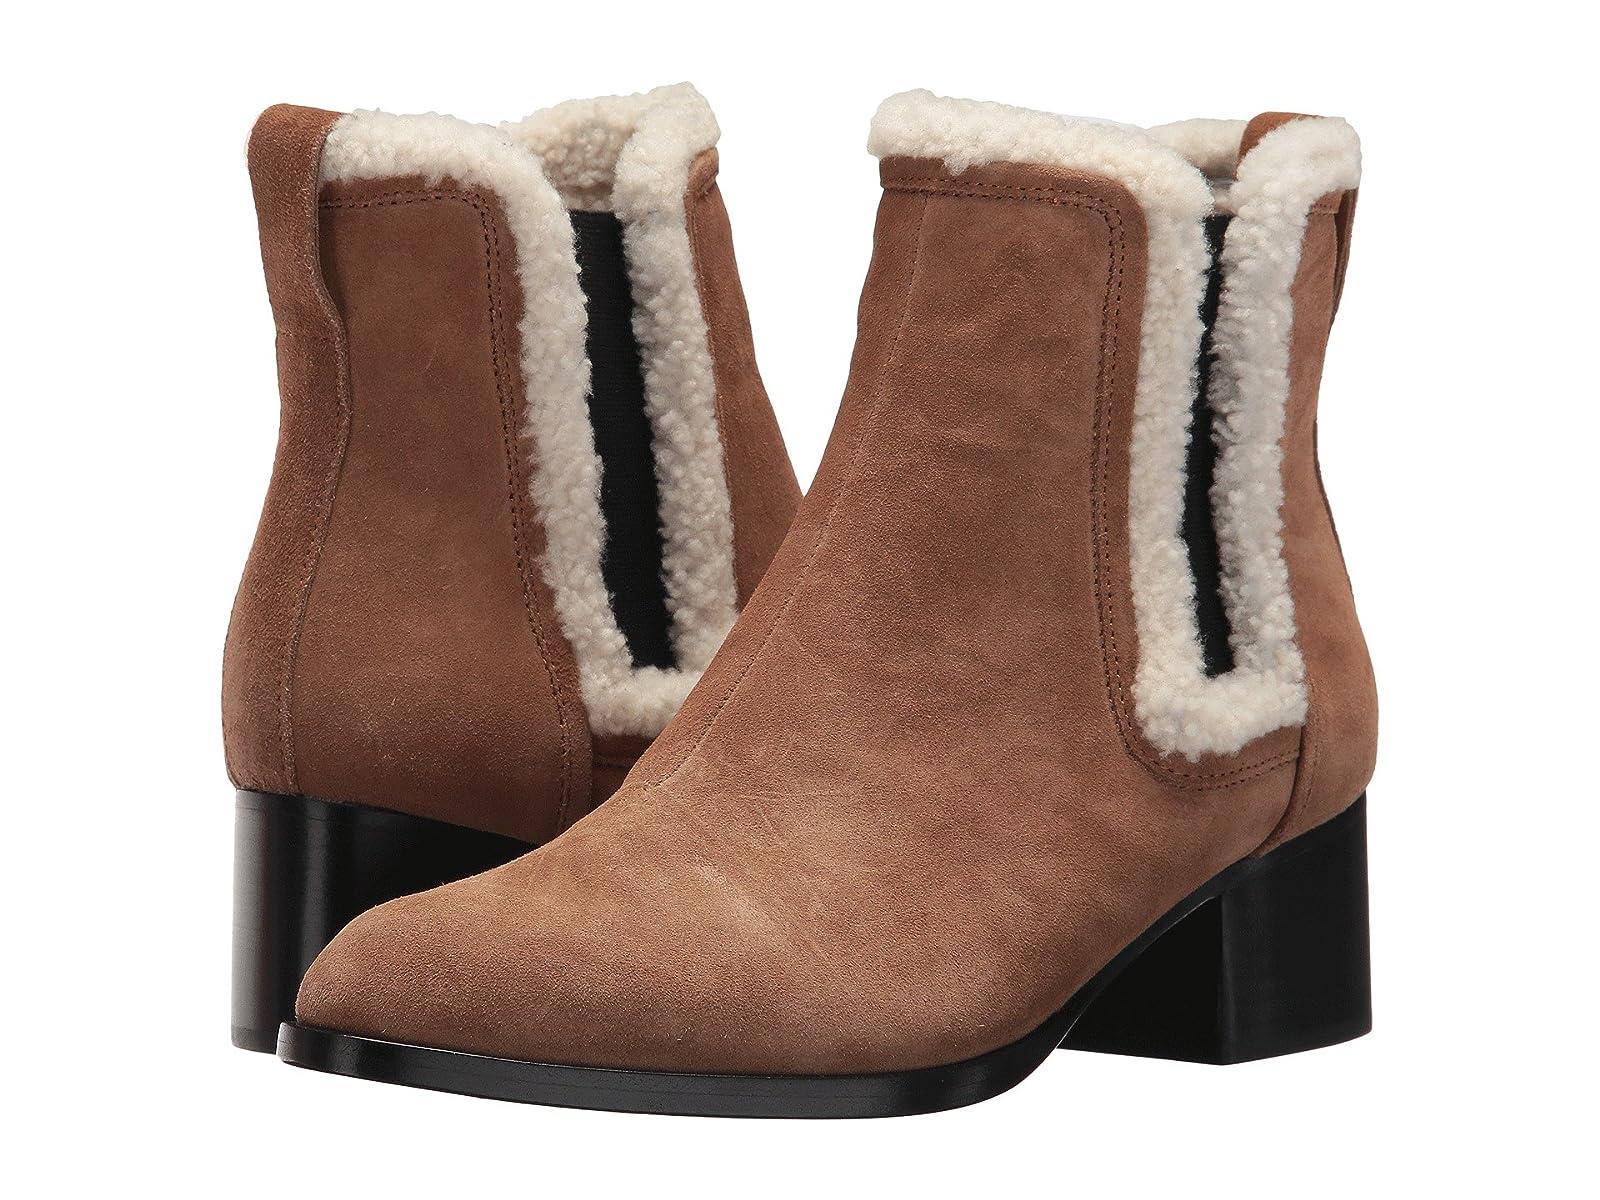 rag & bone Walker BootCheap and distinctive eye-catching shoes